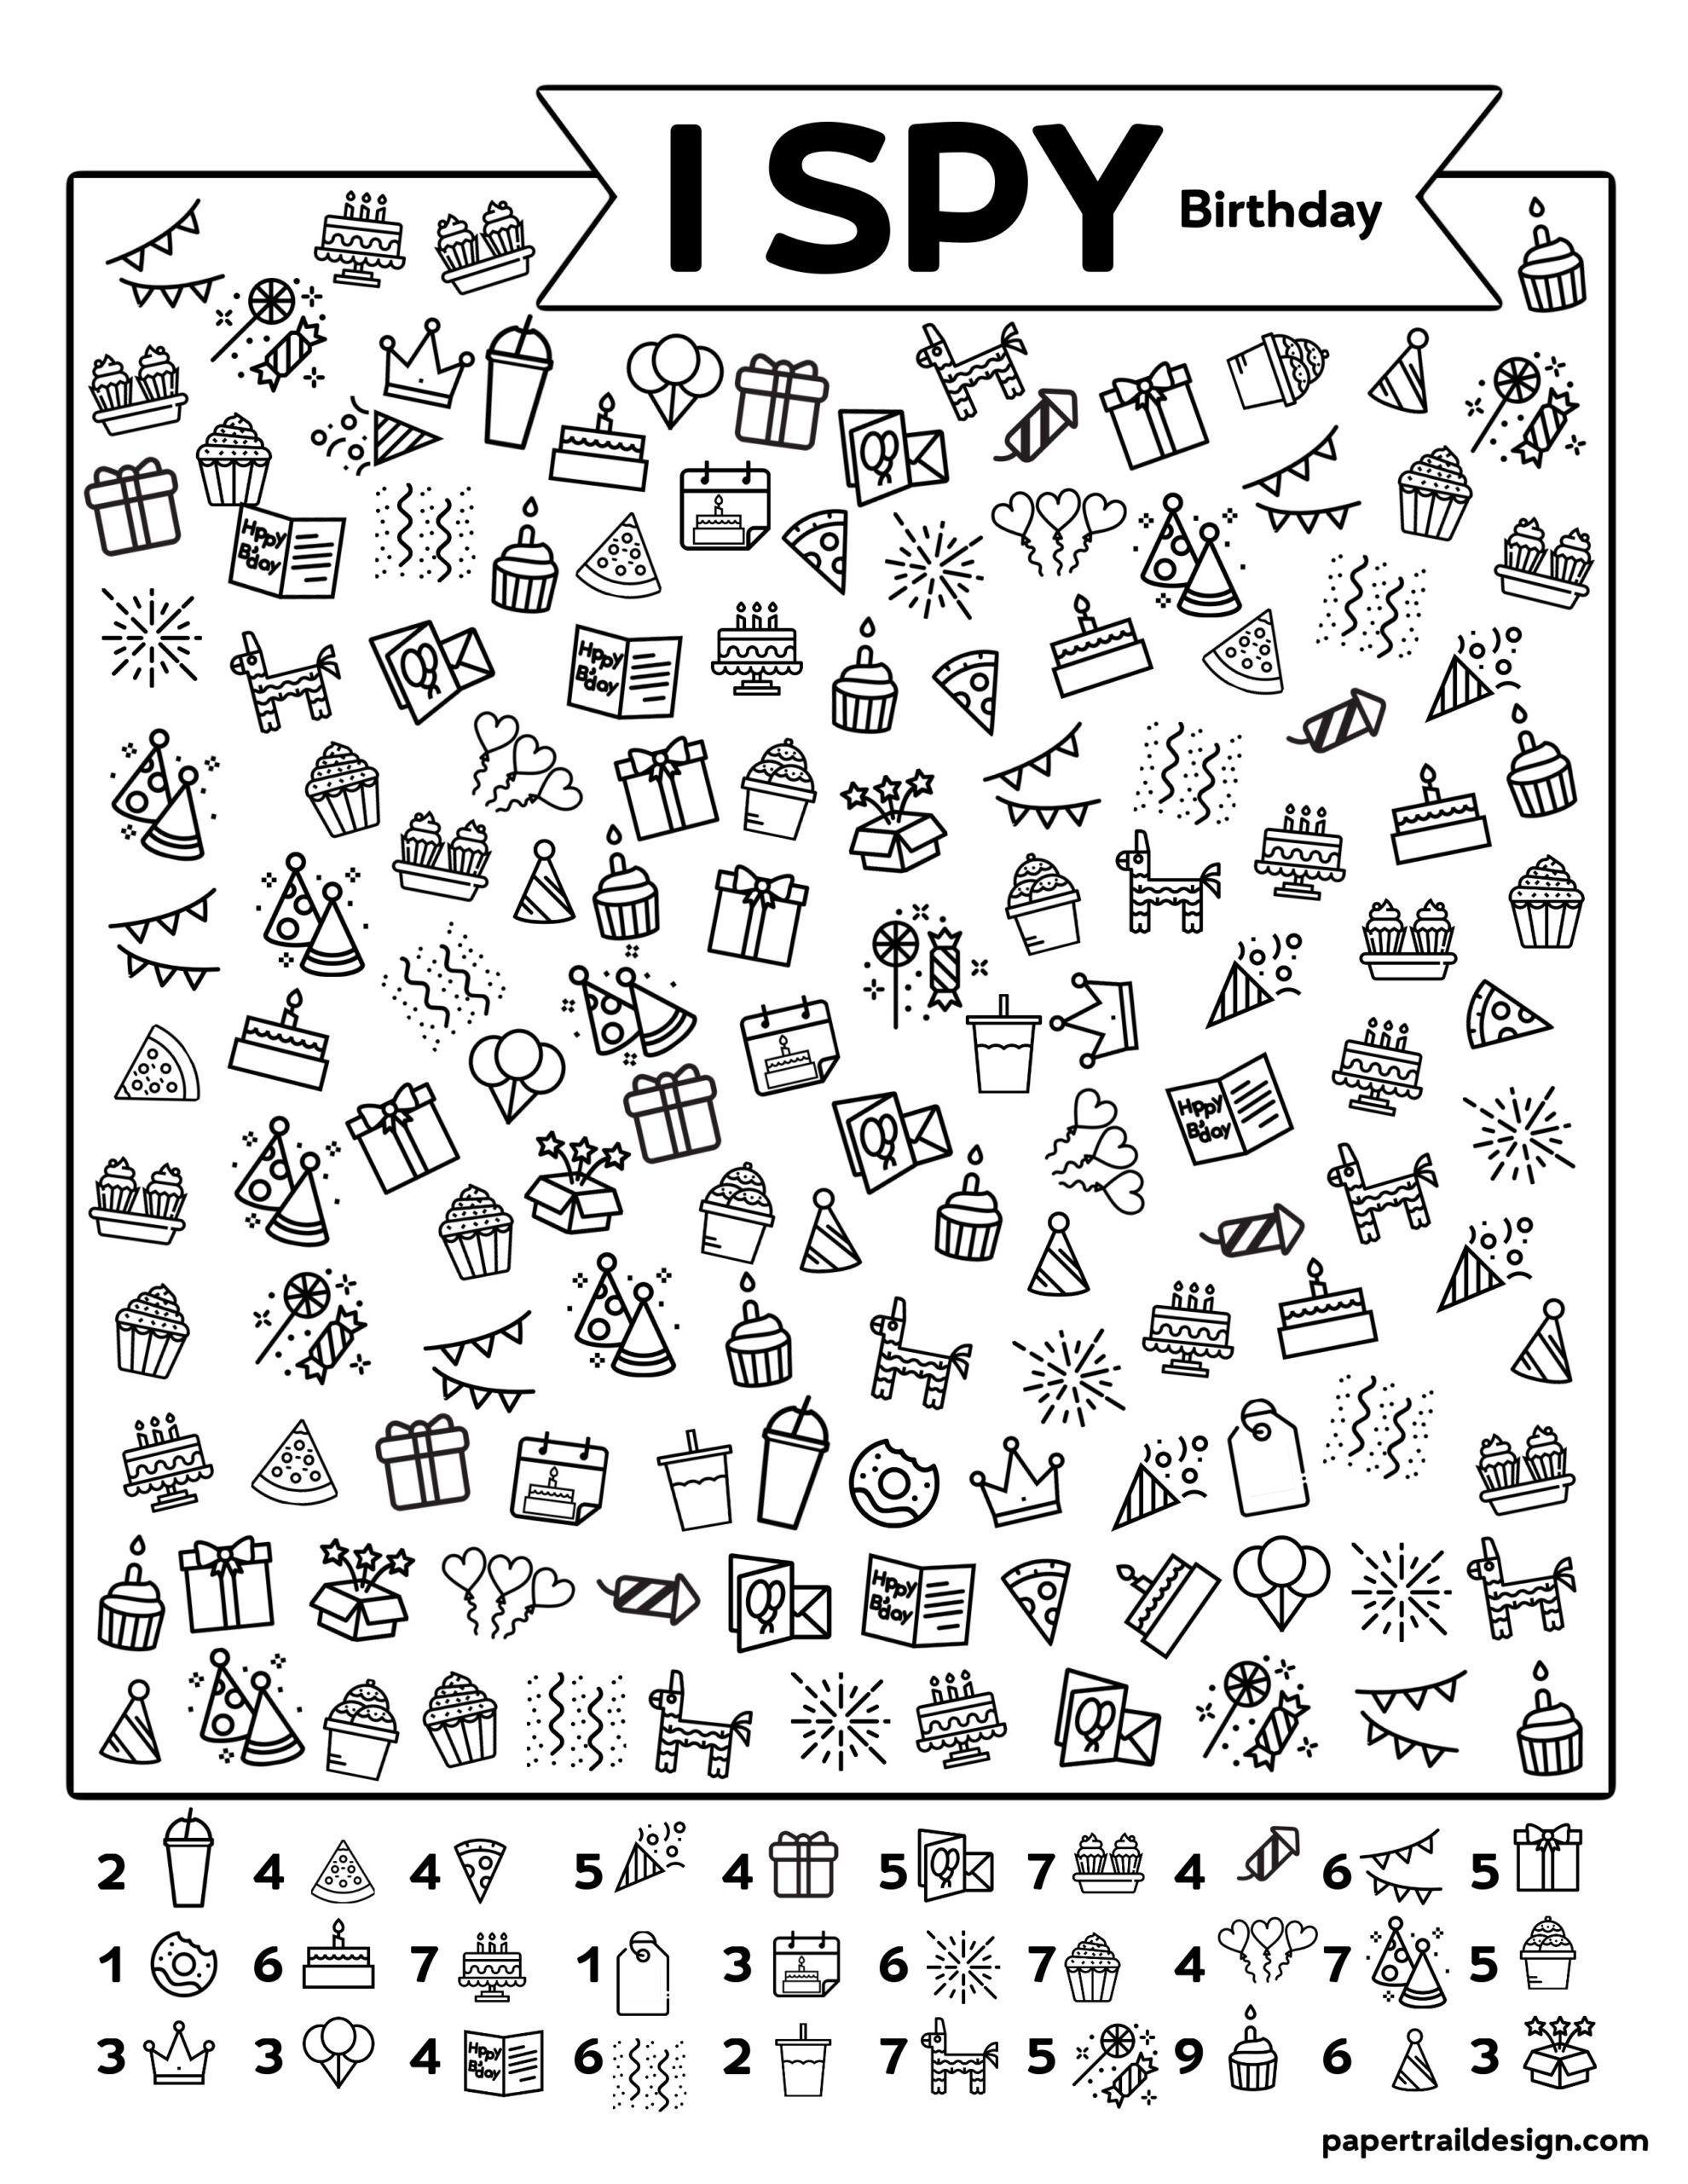 Free Printable I Spy Birthday Activity